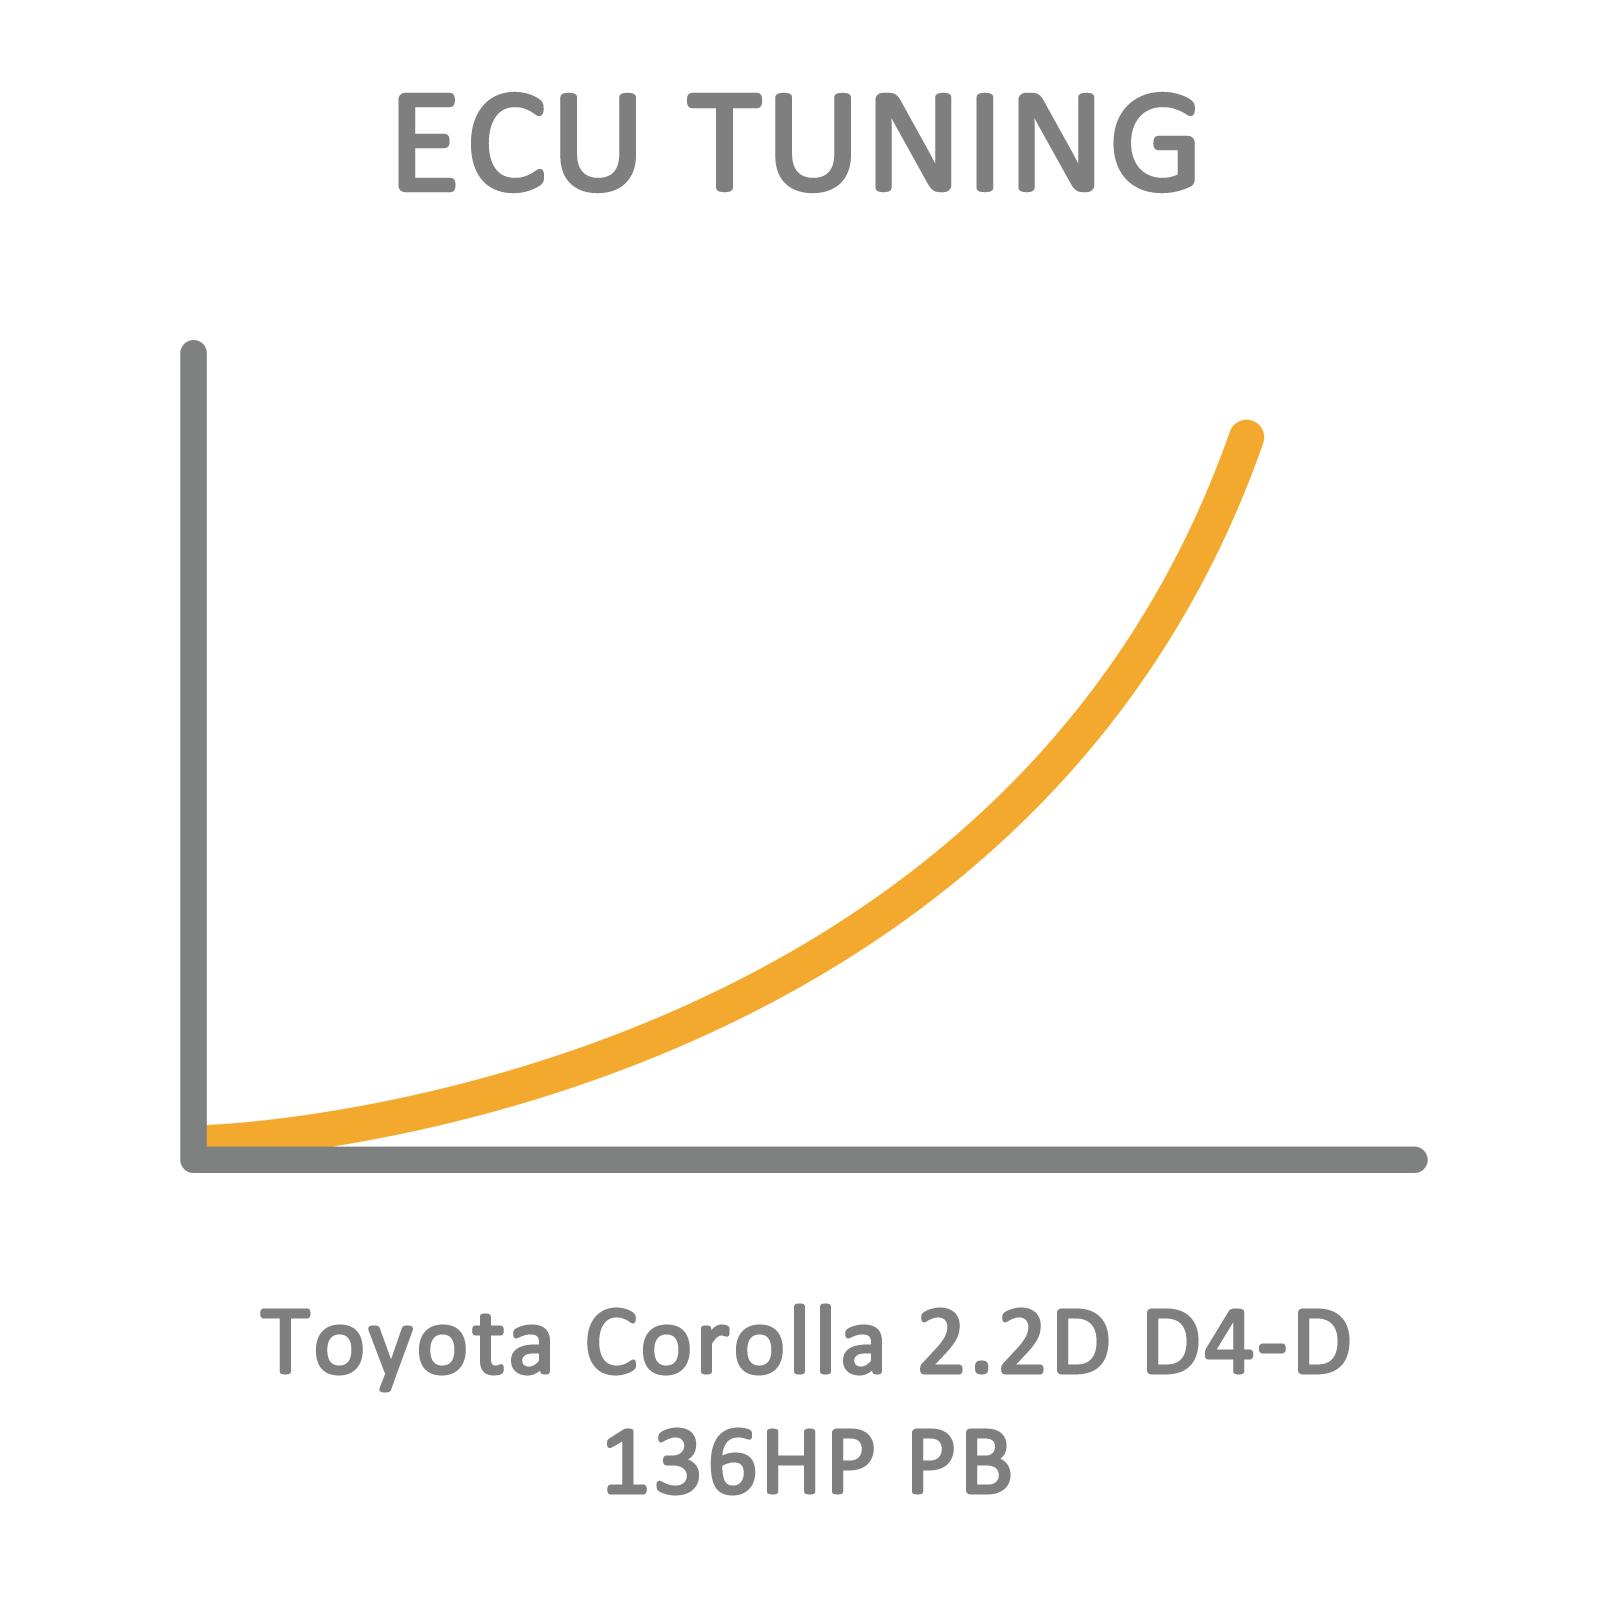 Toyota Corolla 2.2D D4-D 136HP PB ECU Tuning Remapping